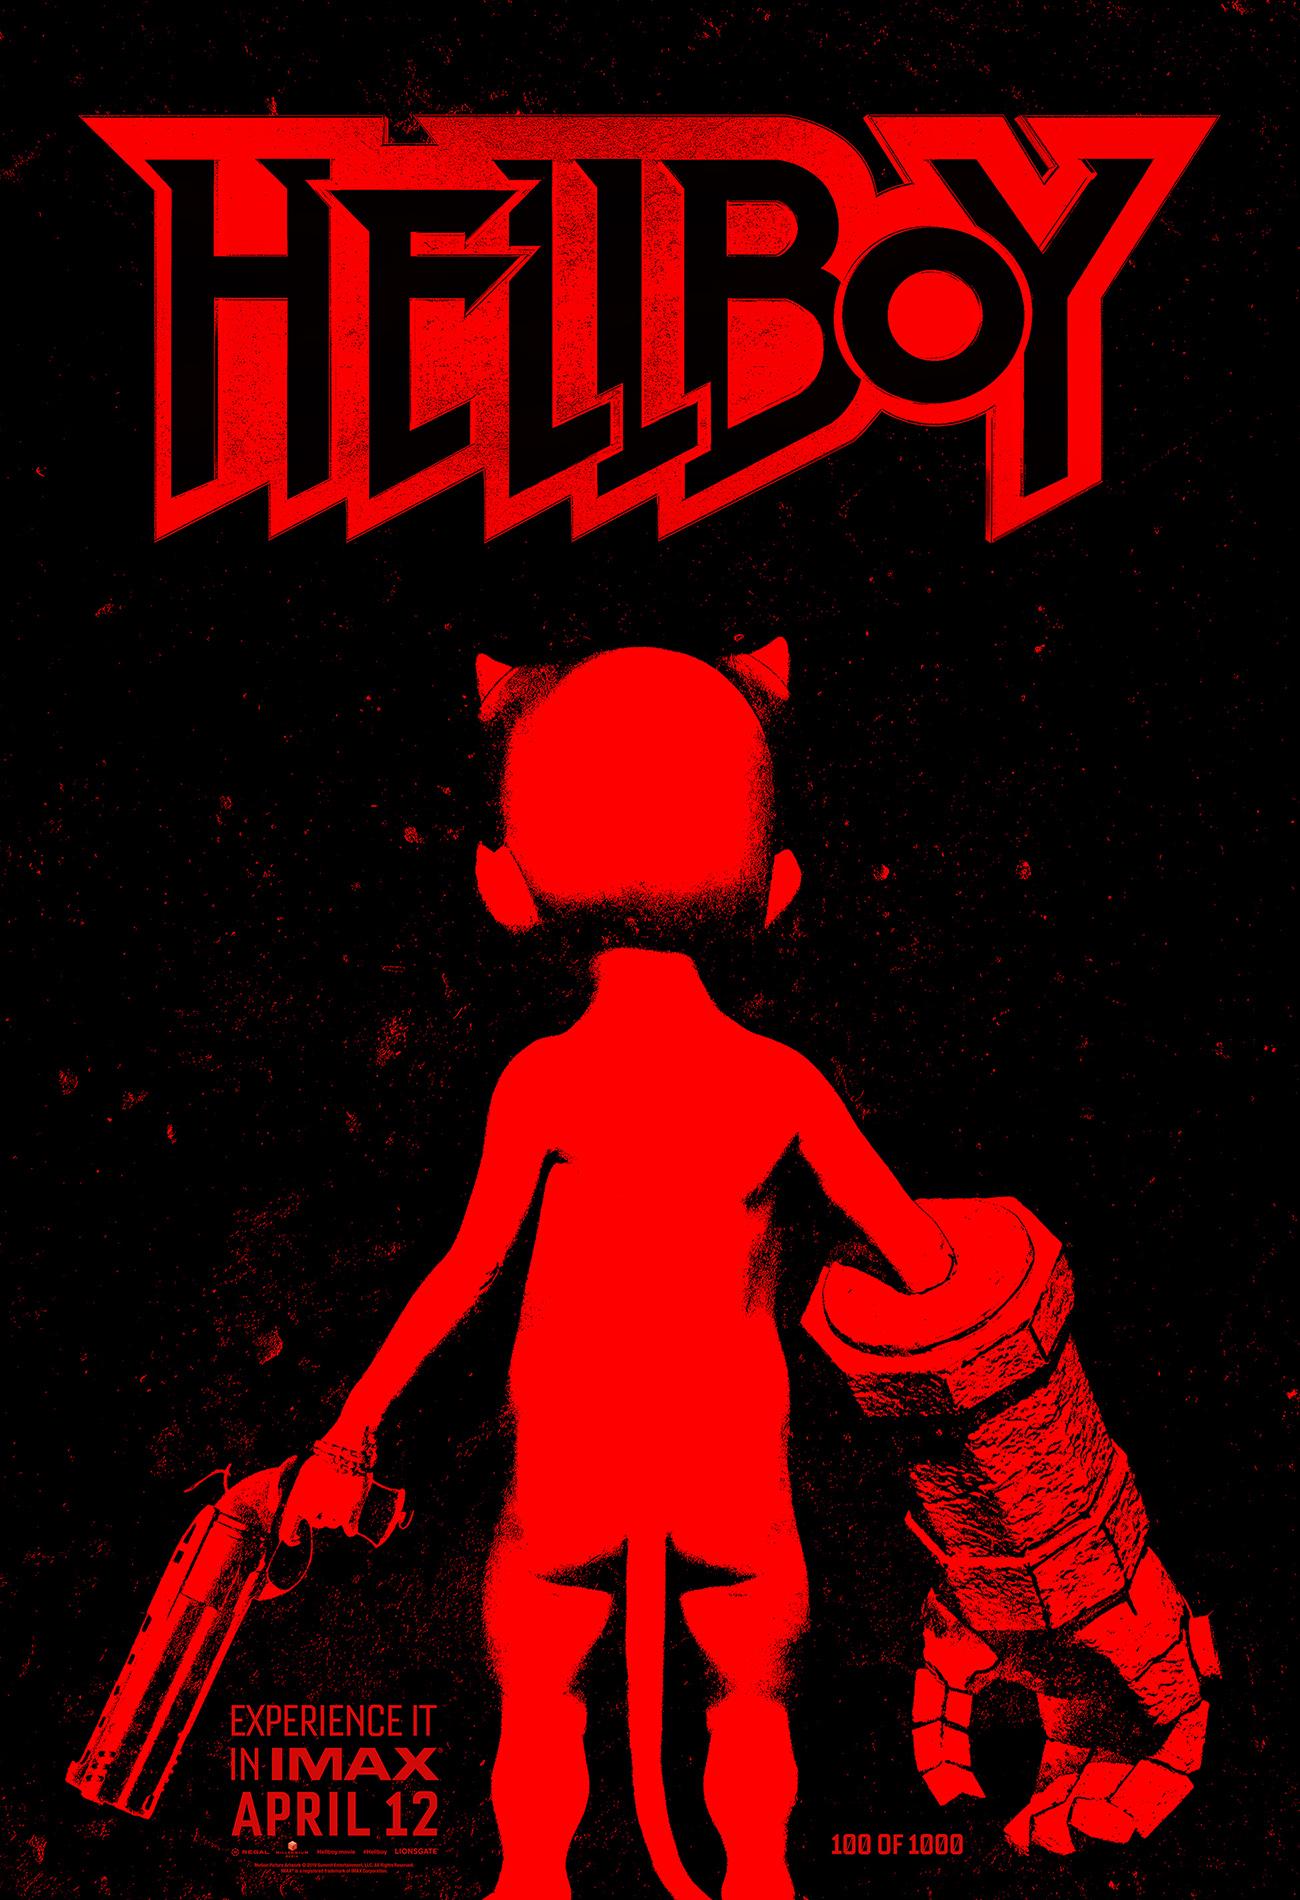 Hellboy_Regal_1Sht_Baby_100dpi.jpg